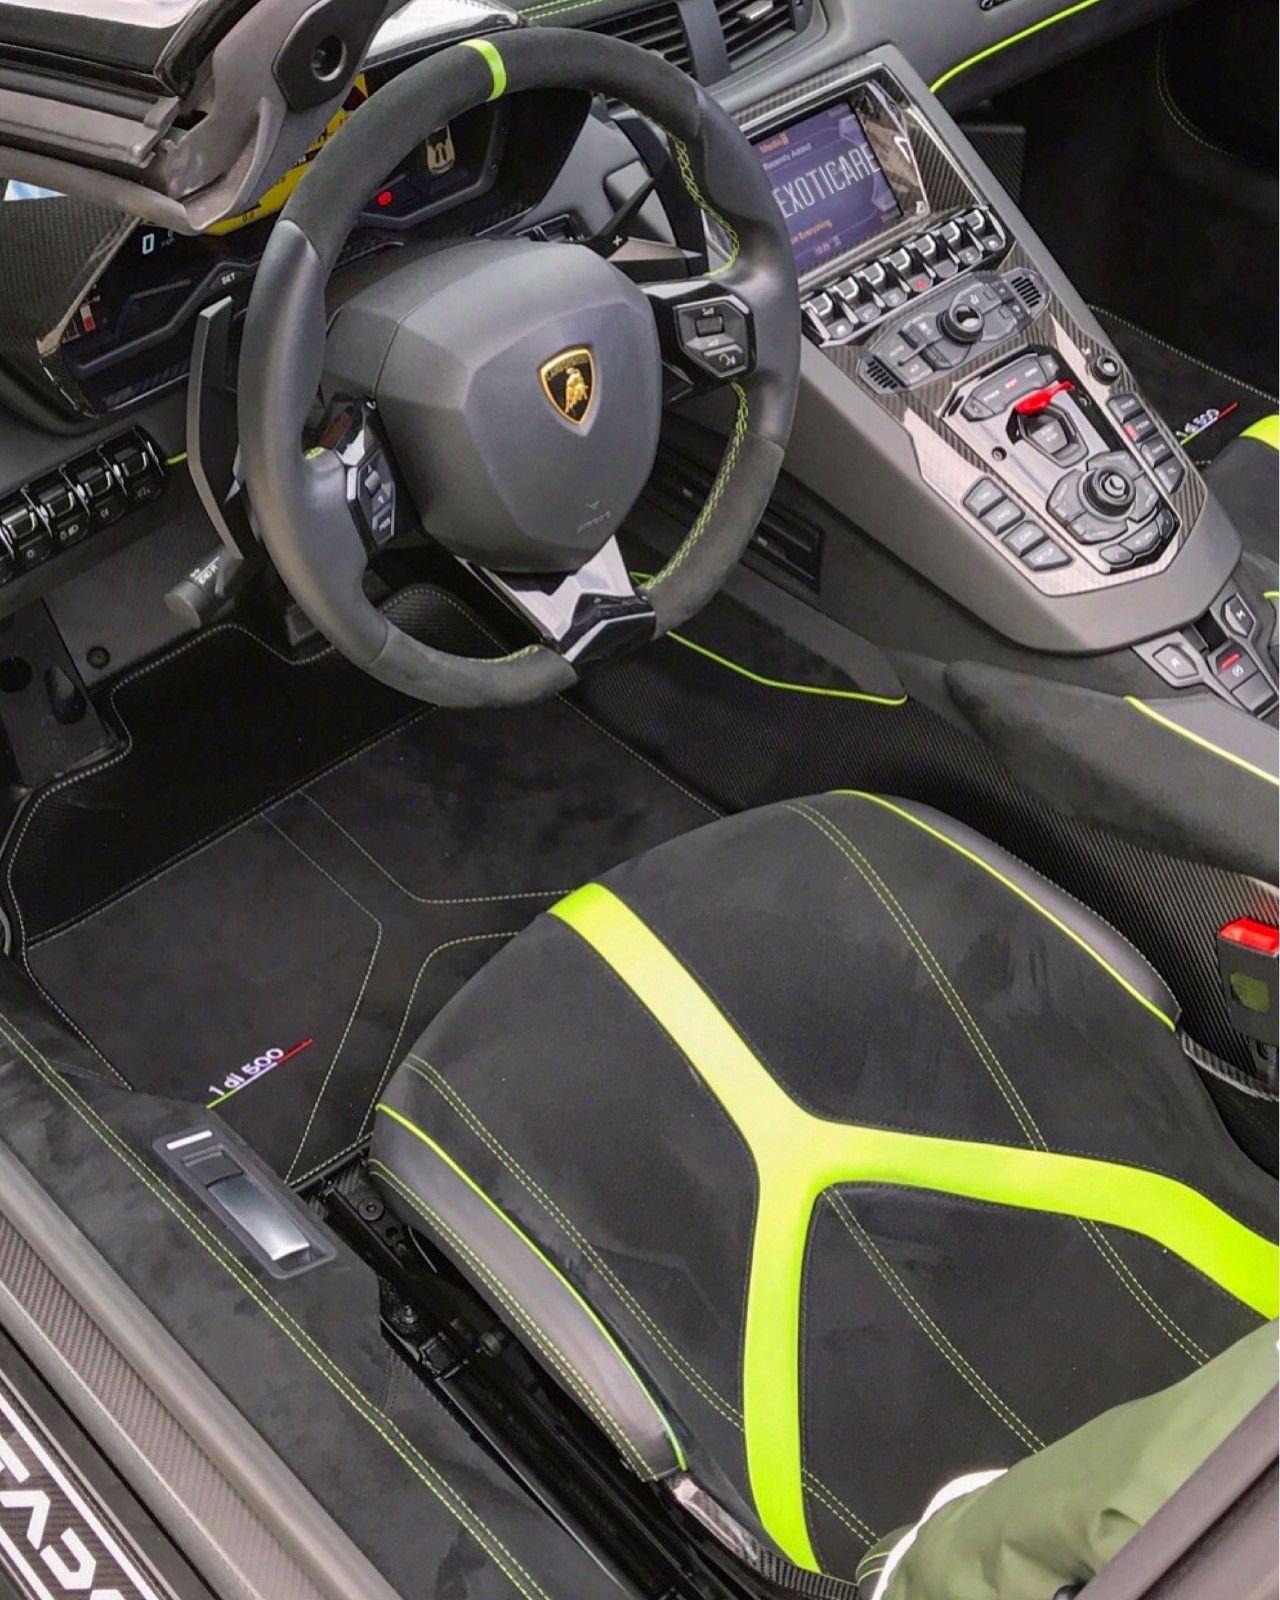 Amazing Lamborghini Huracan Performante Floor Mats Alcantara And Carbon Fiber 2017 2018 24cars